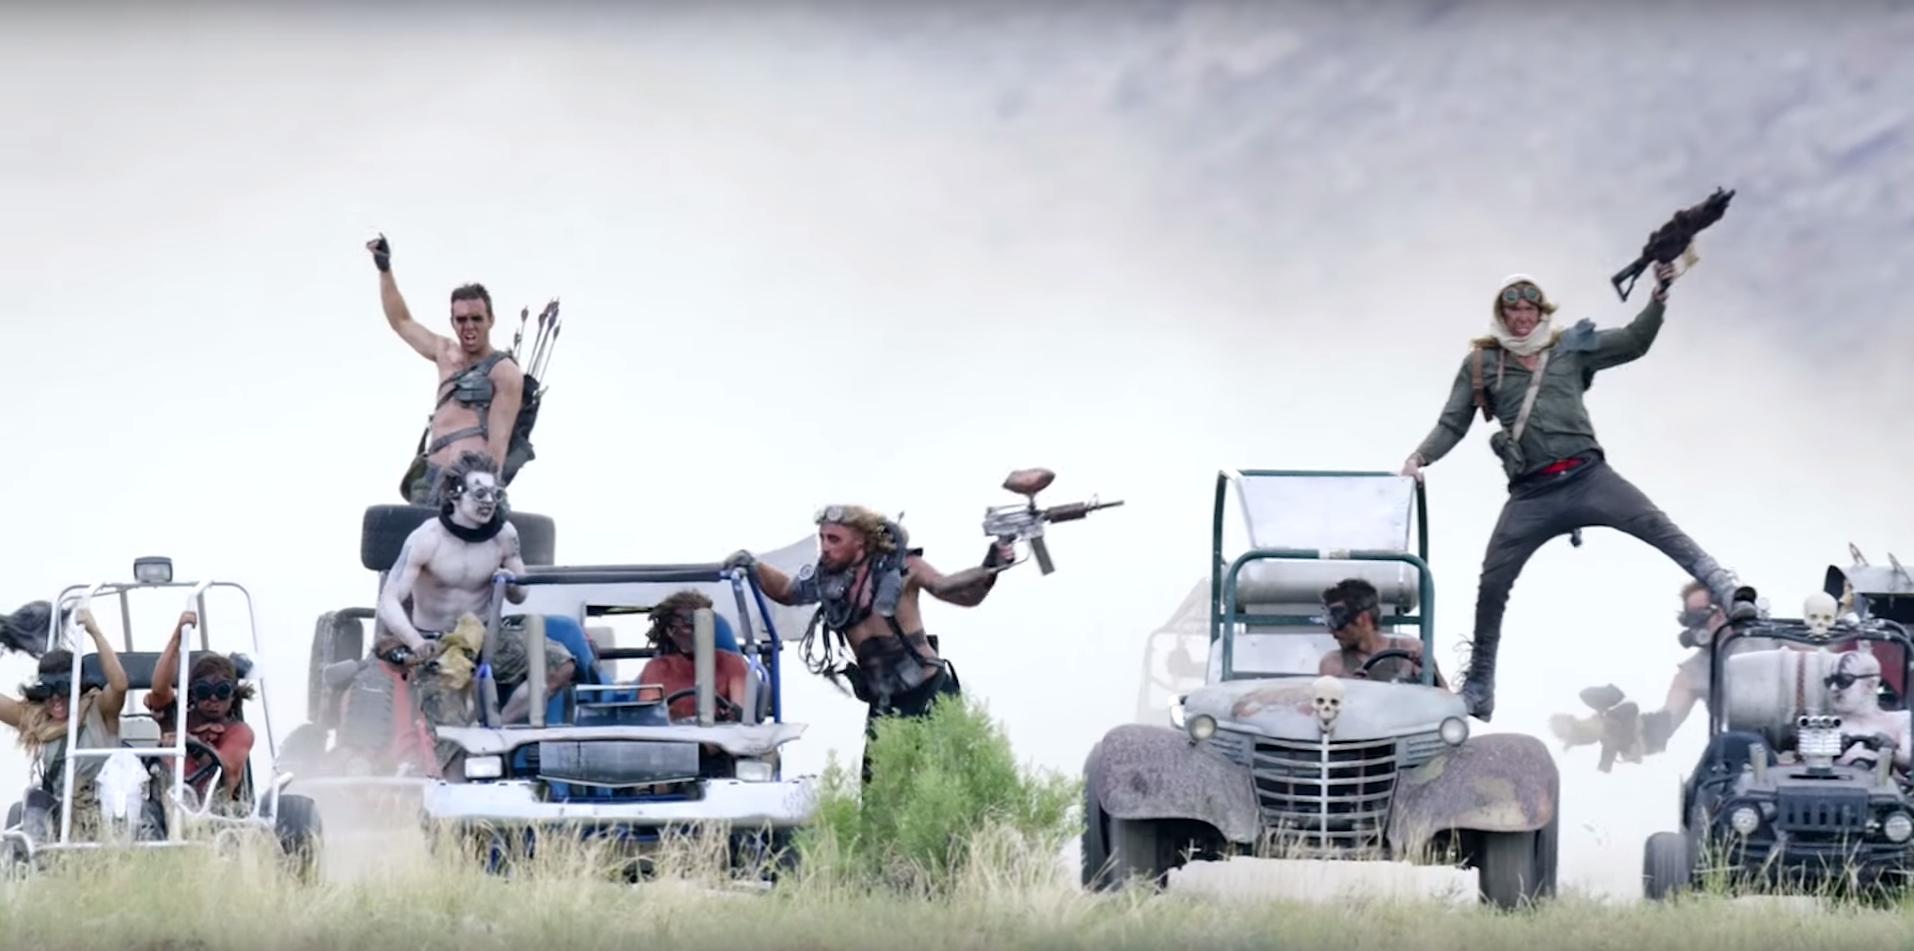 Mad Max go kart video